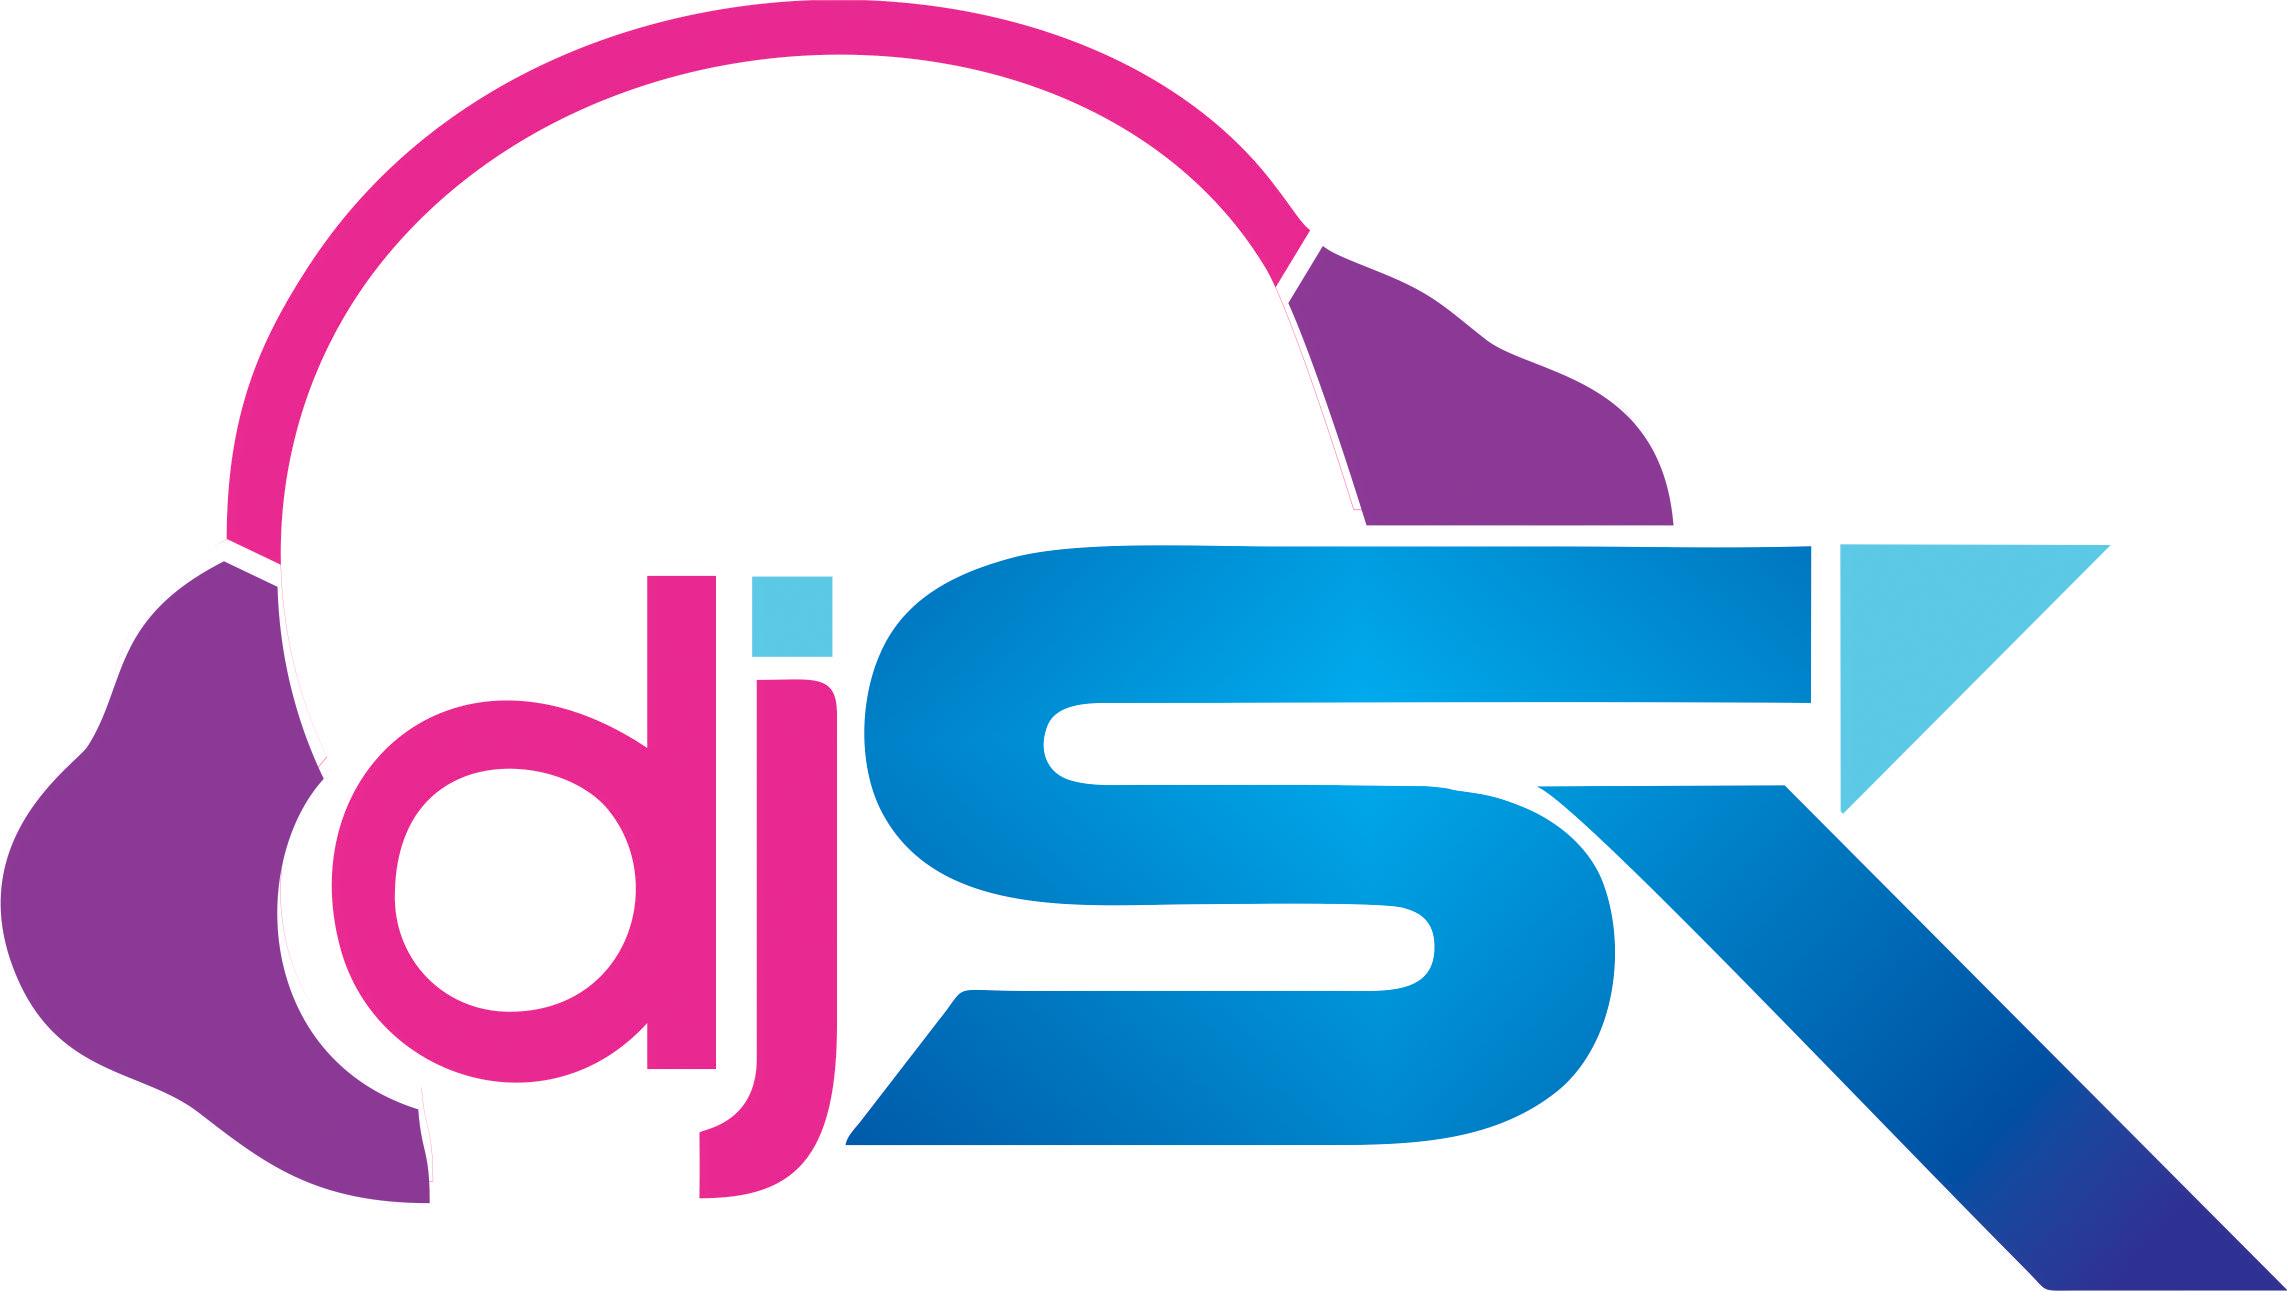 Final png update required. Dj clipart dj logo